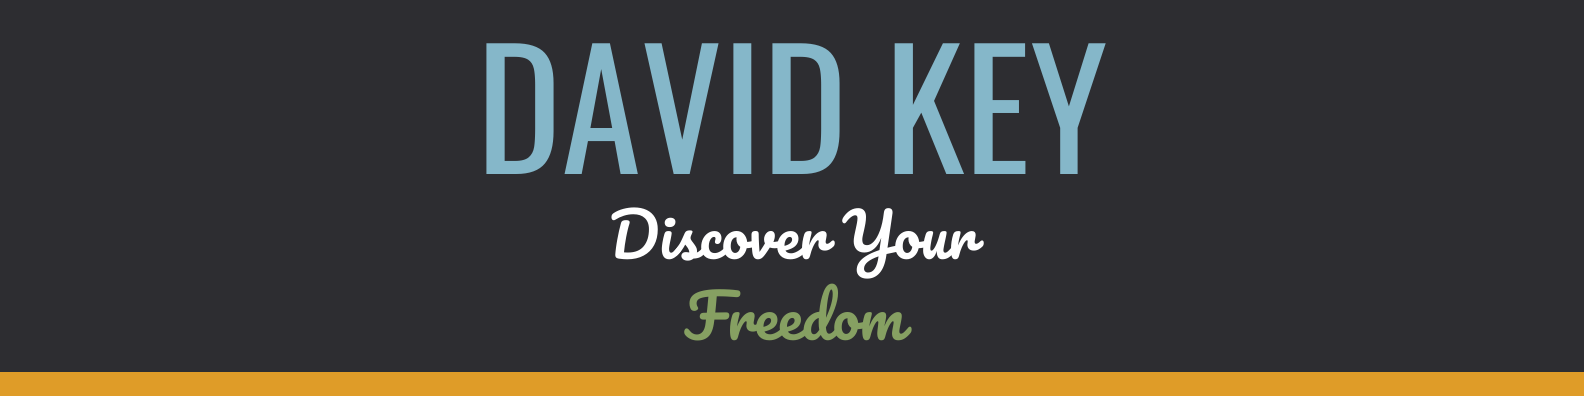 David Key - Award Winning Transformative Coach, Author & Speaker